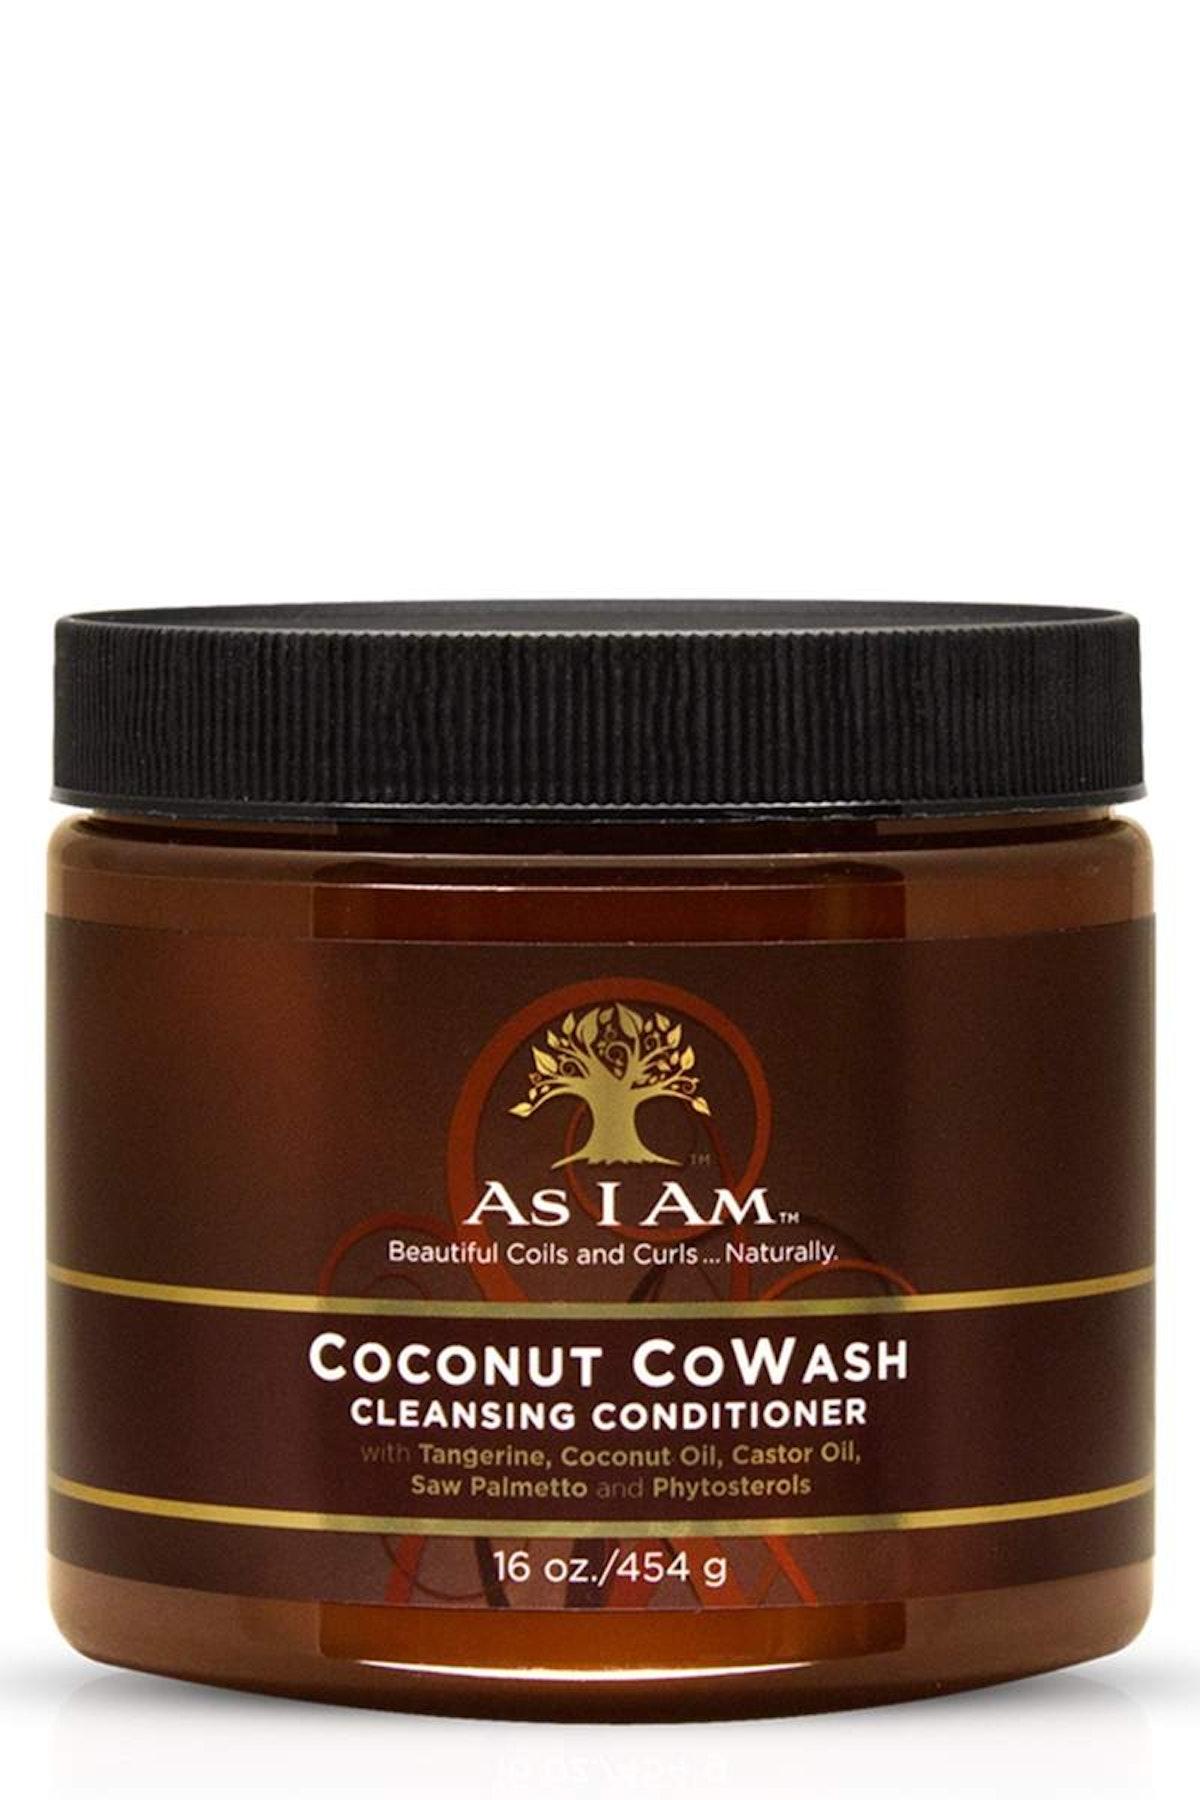 Coconut Cowash Cleansing Conditioner